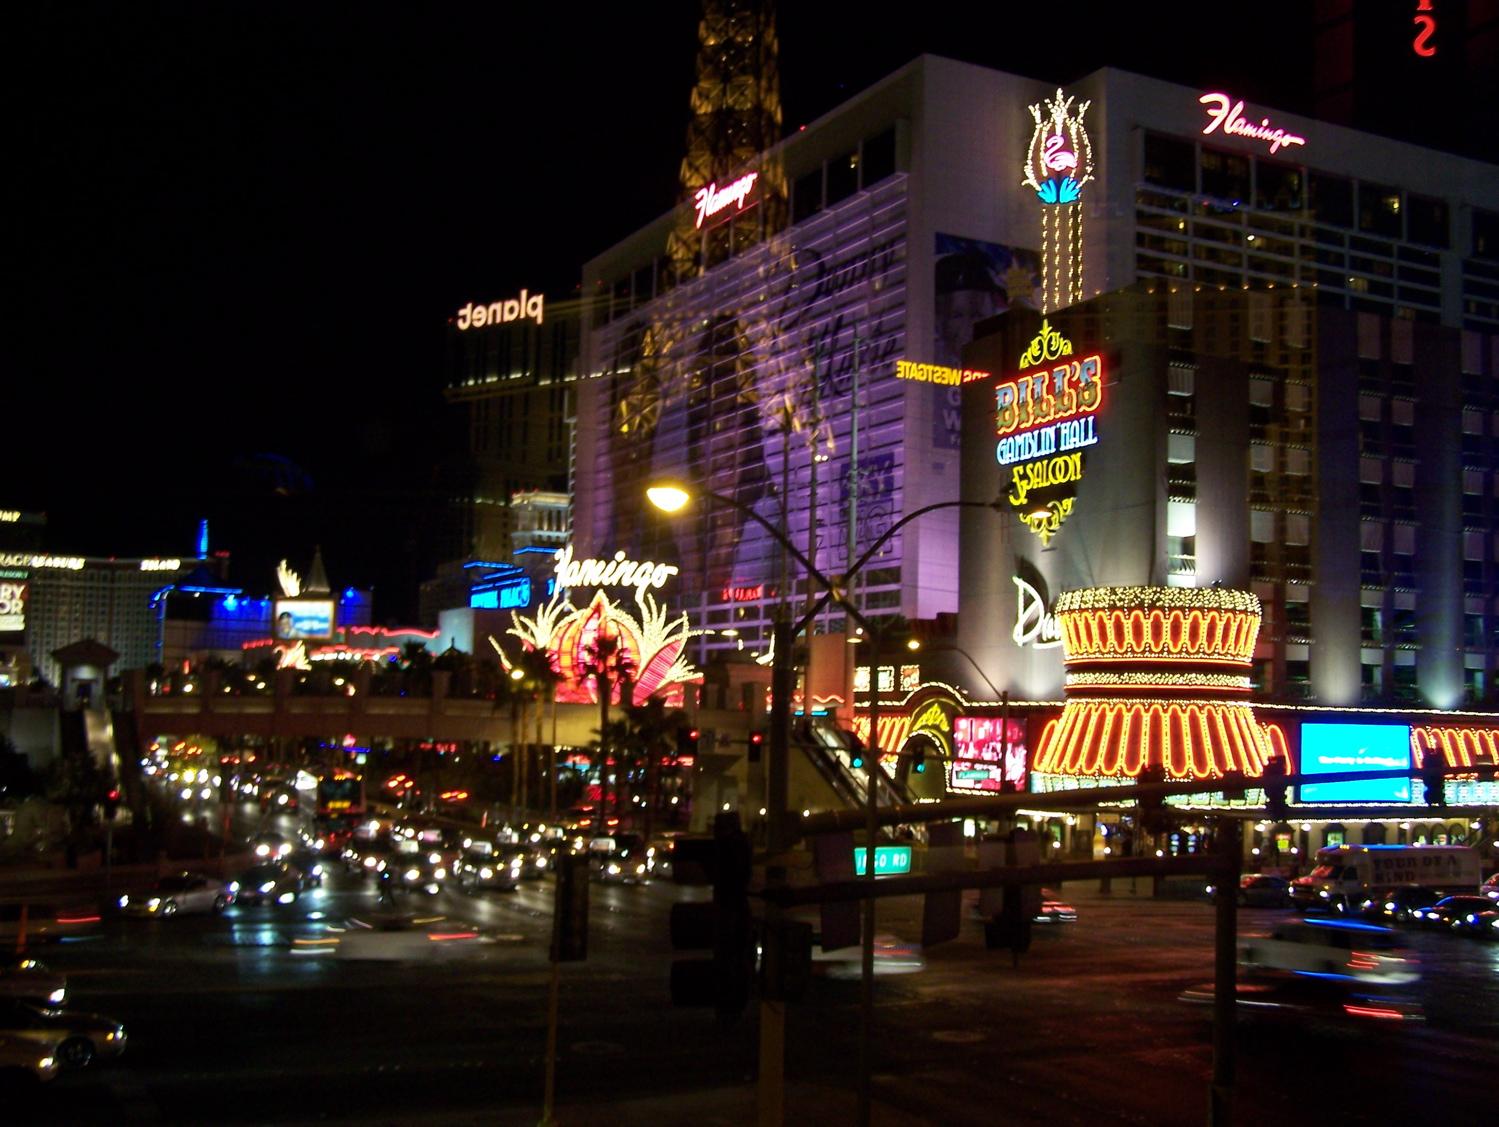 Bills gambling hall las vegas nv harringtons raceway and casino